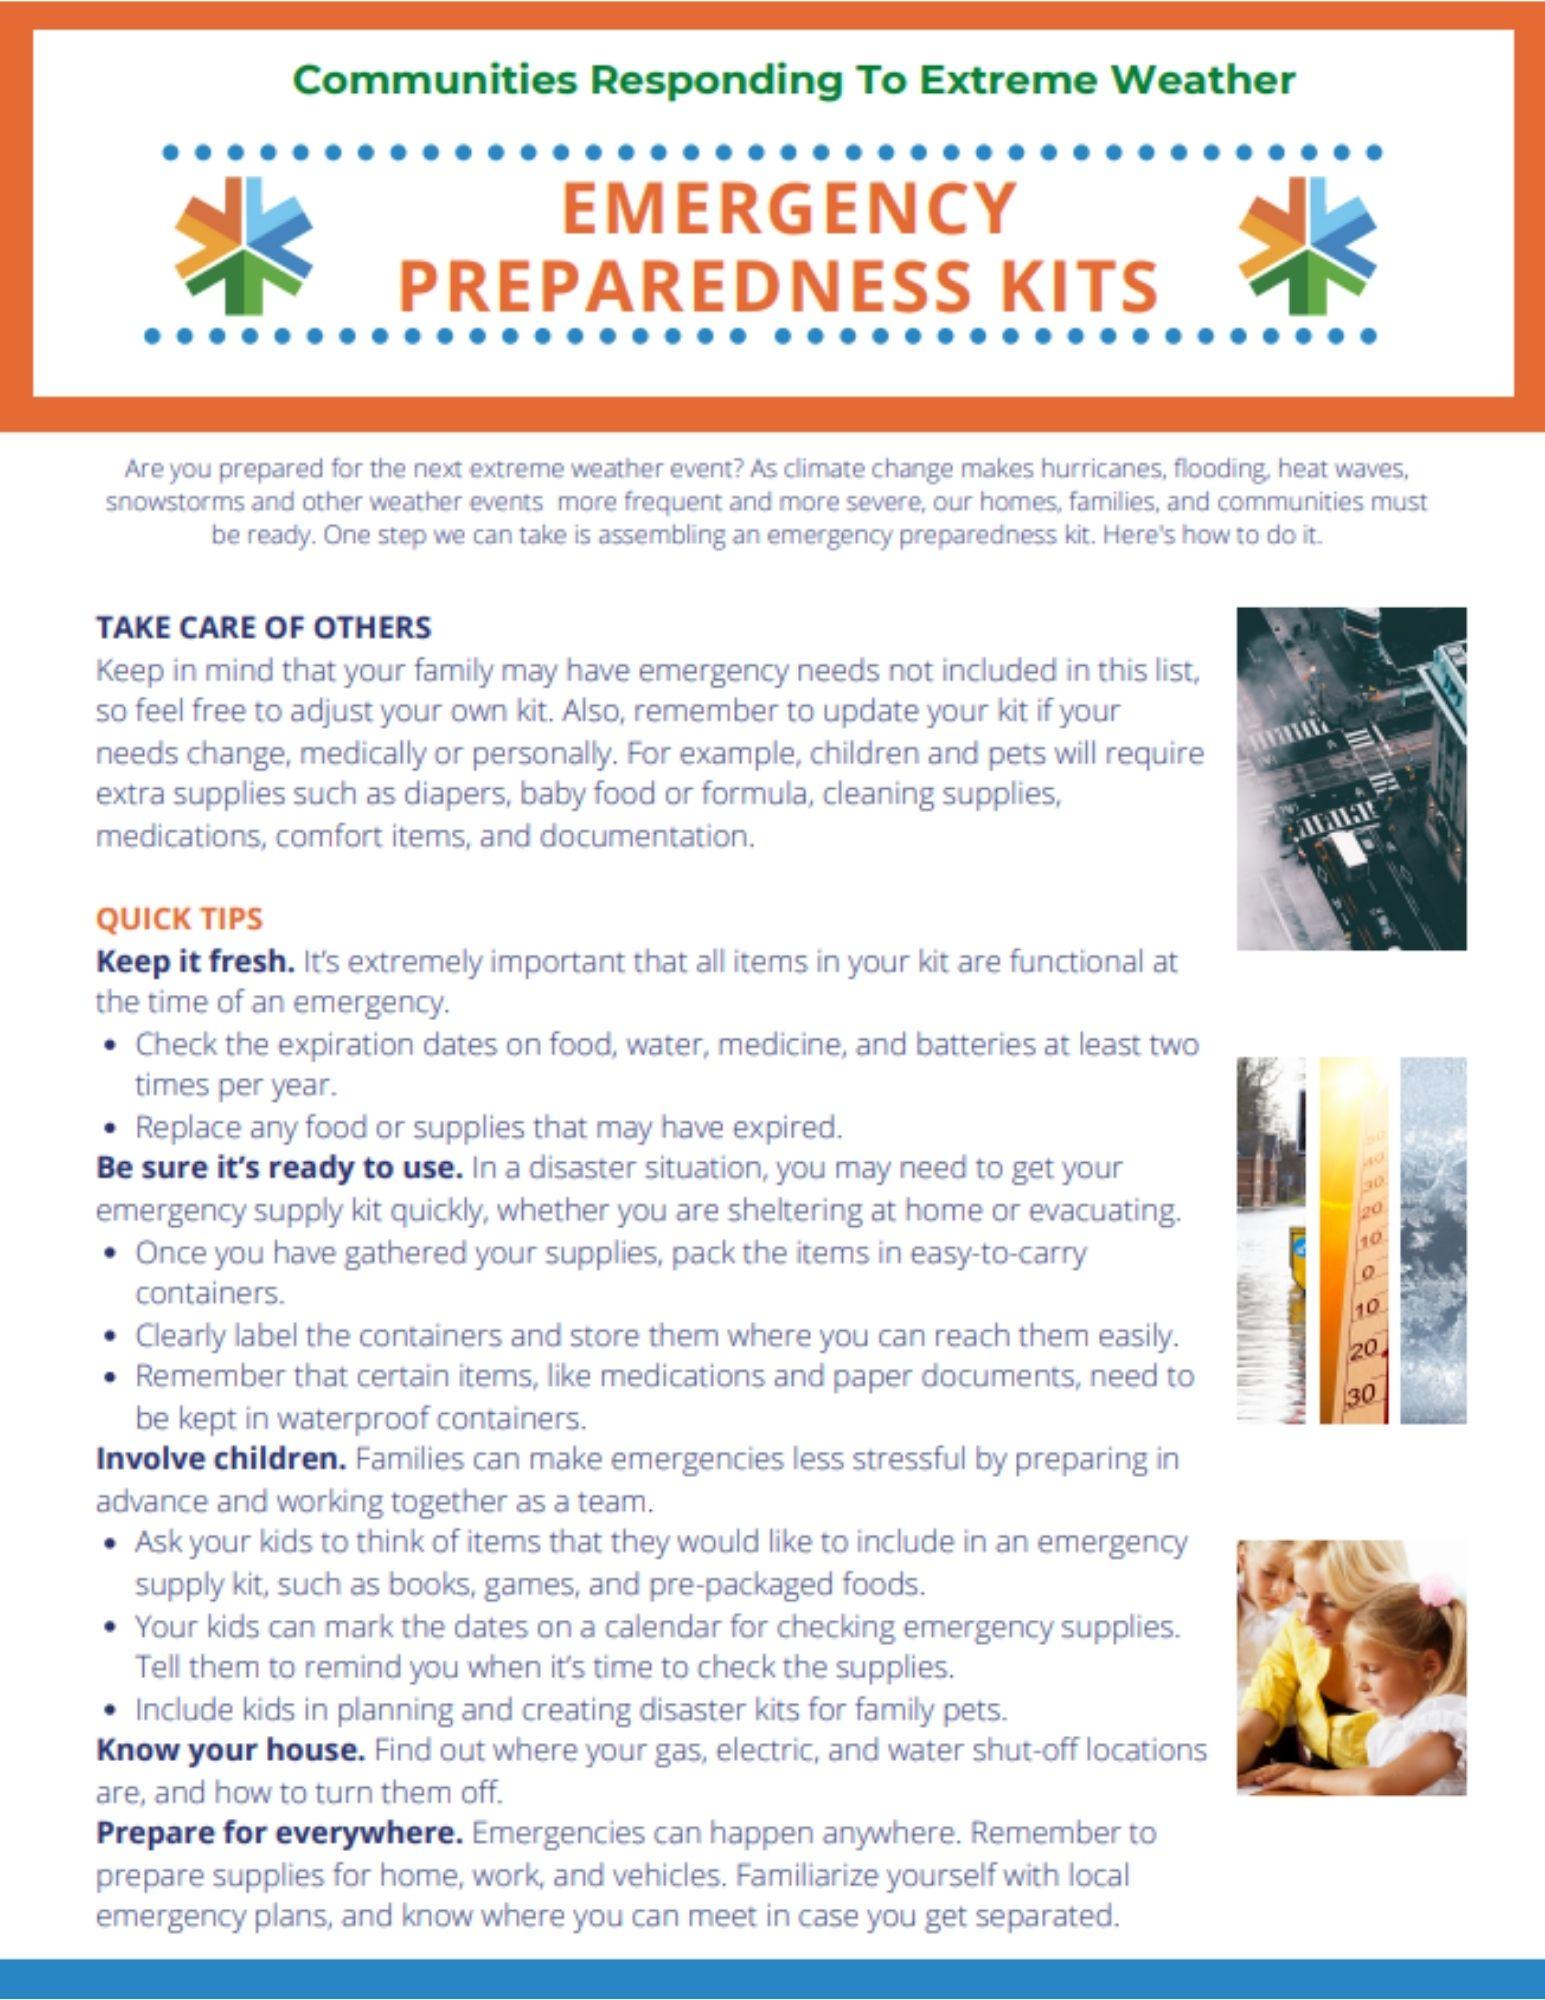 Emergency Preparedness Kits Brochure